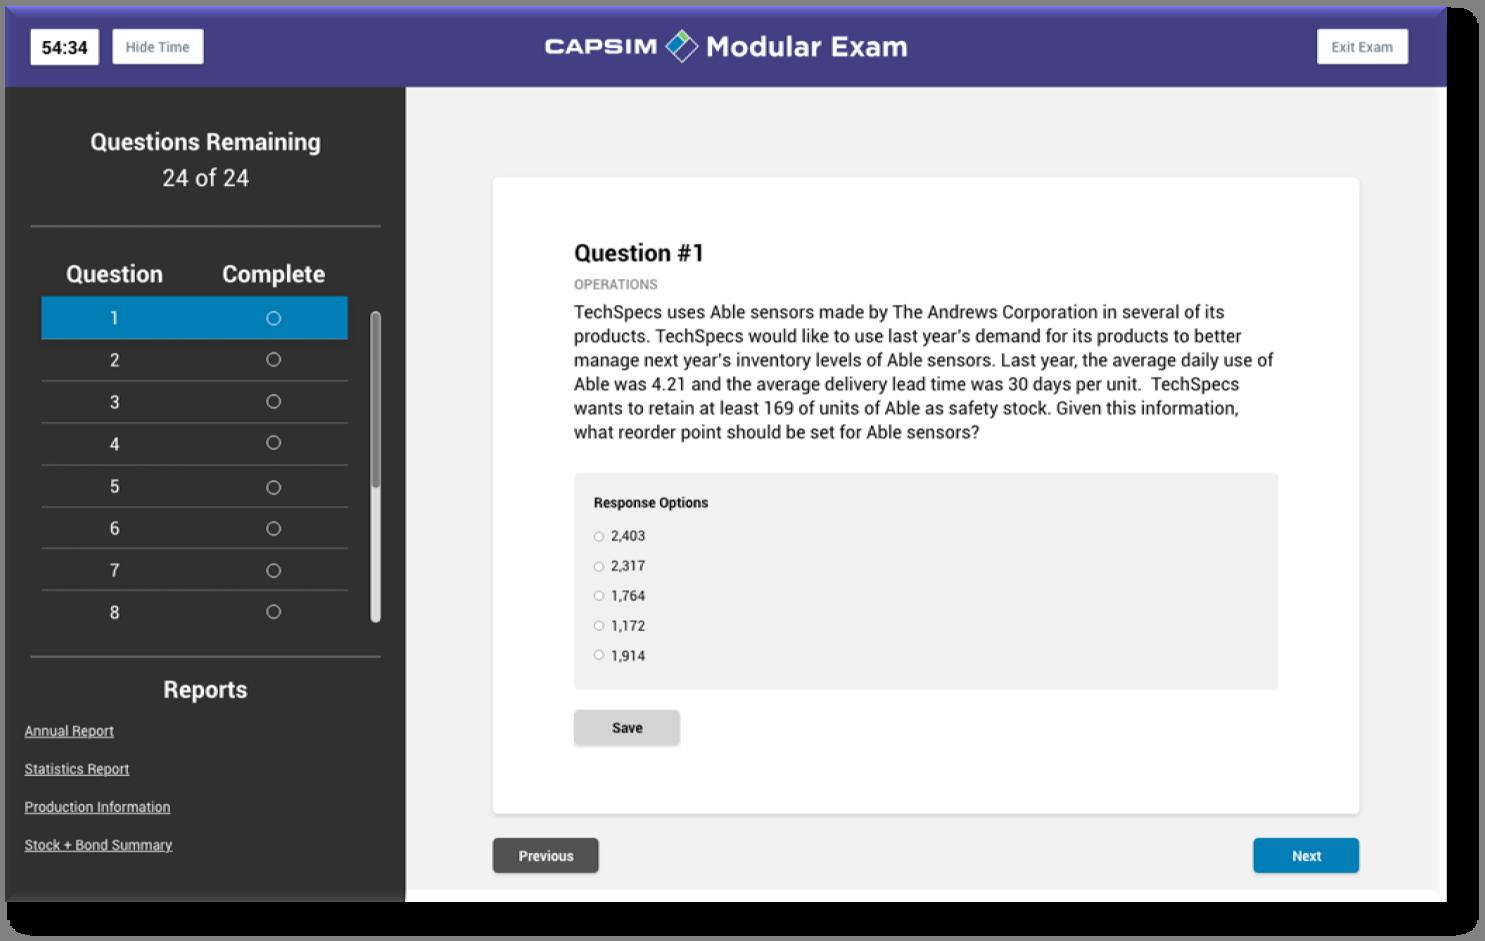 Capsim-Modular-Exam_Webapp